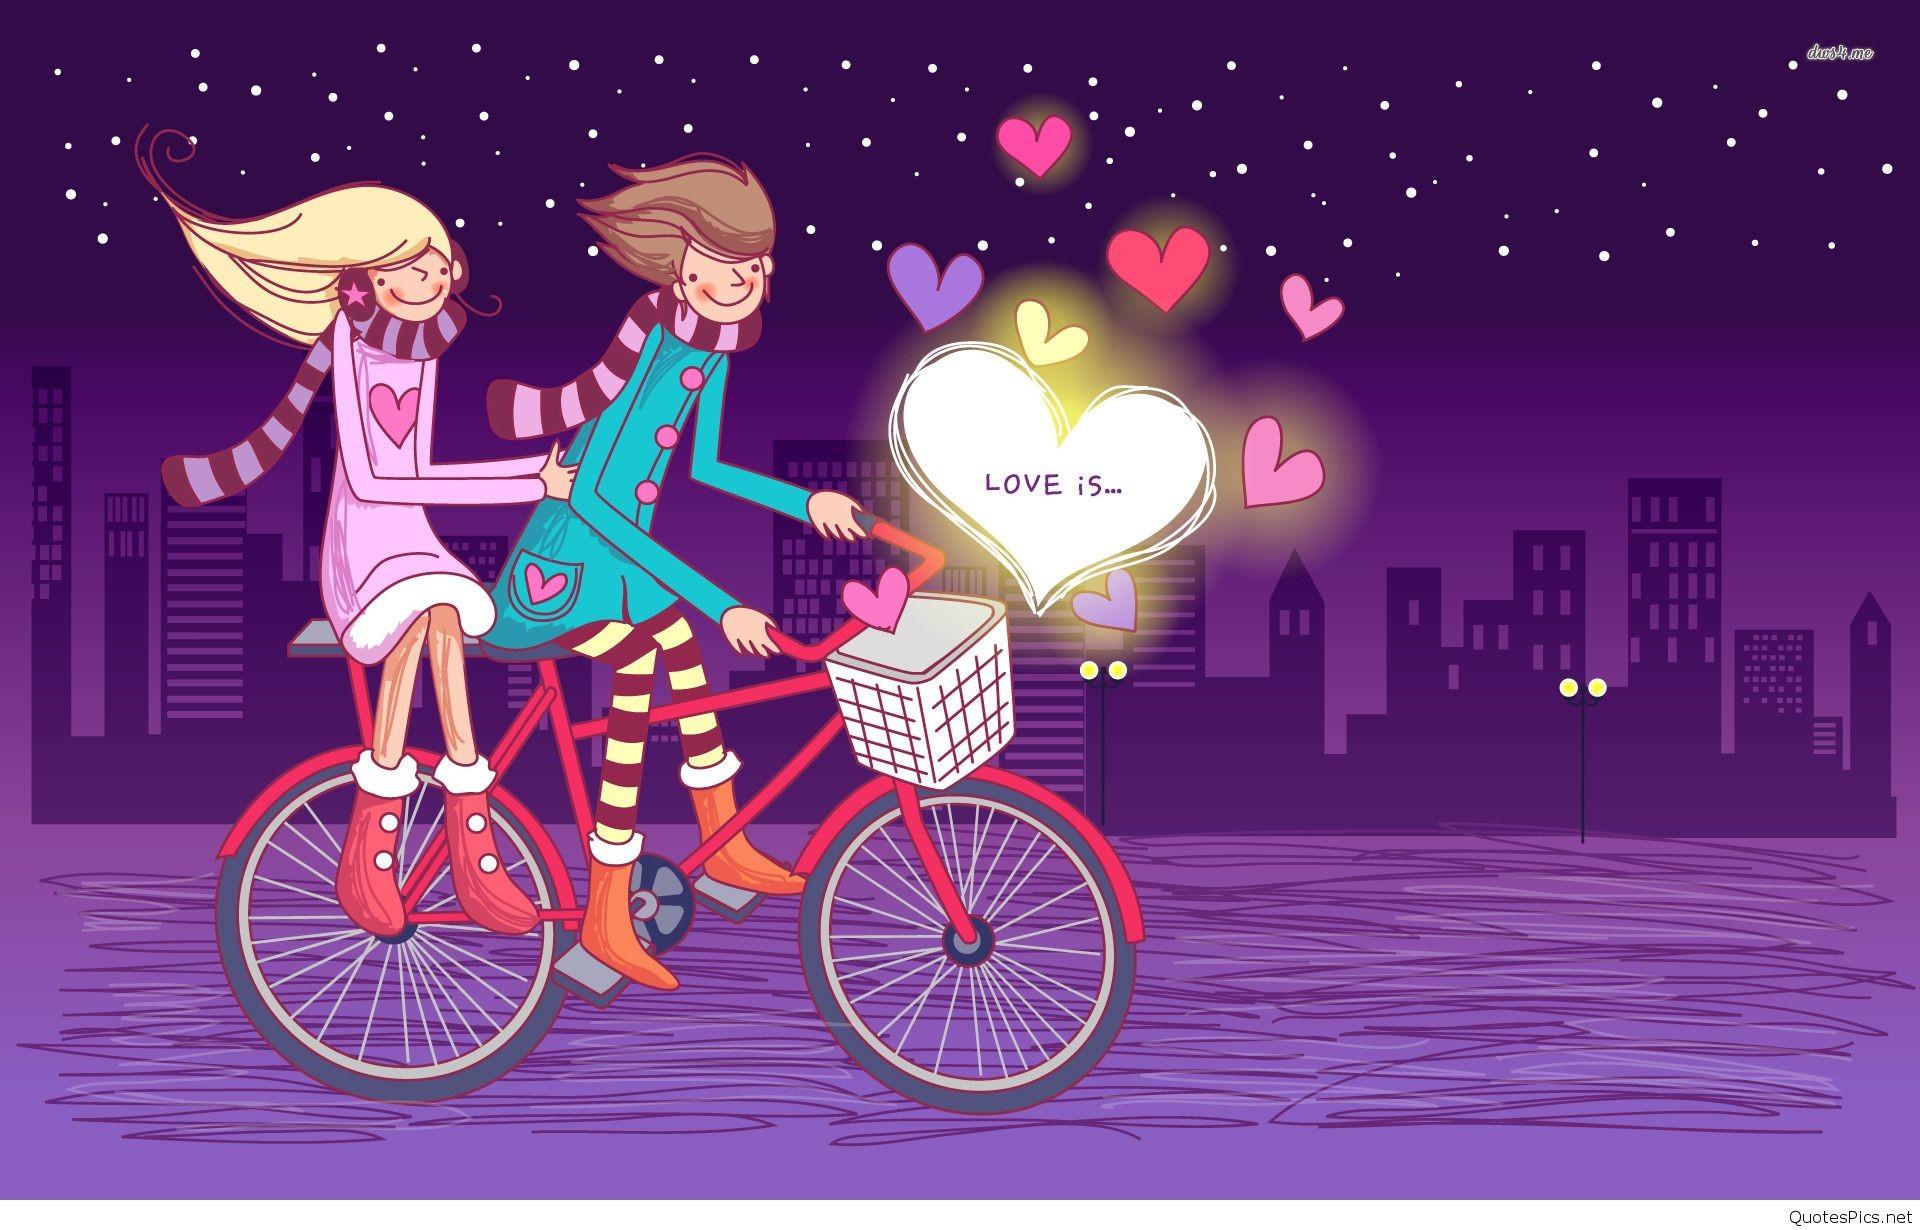 valentines-day-animated-cartoon-wallpaper-free-hd-desktop